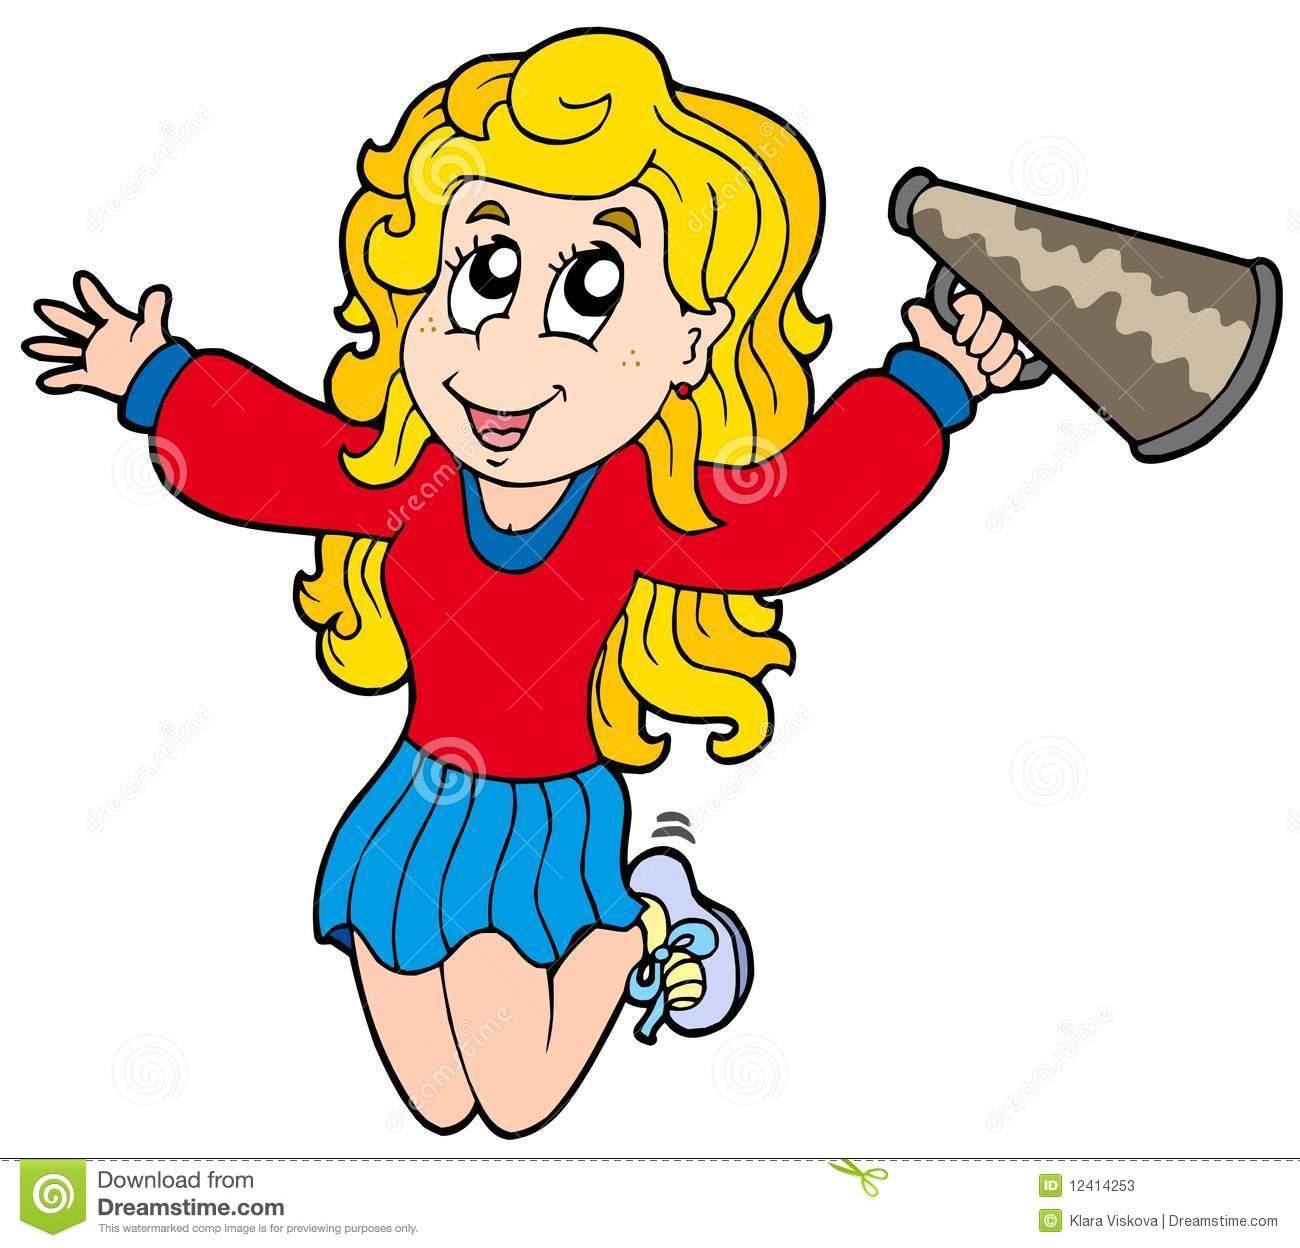 Cartoon Cheerleader Clipart & Cartoon Cheerleader Clip Art Images.